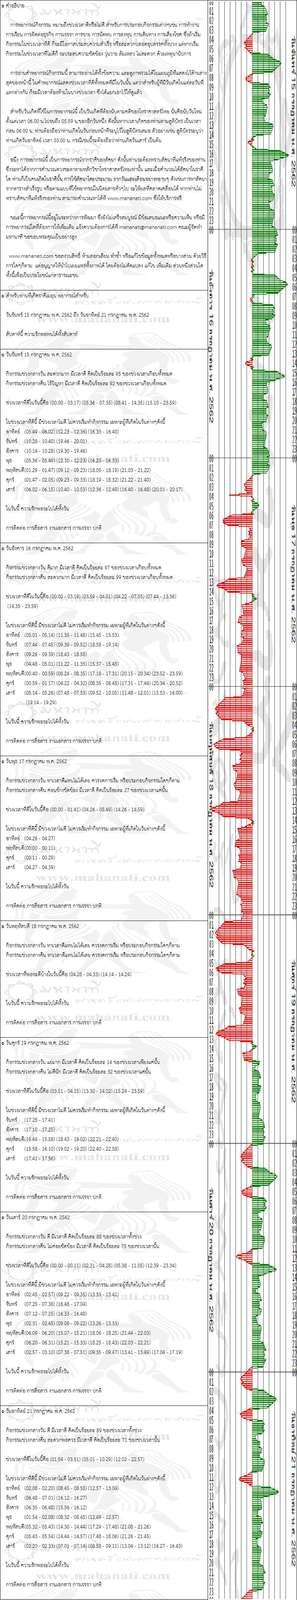 puh3xm17sry4X56RYNl-o.jpg